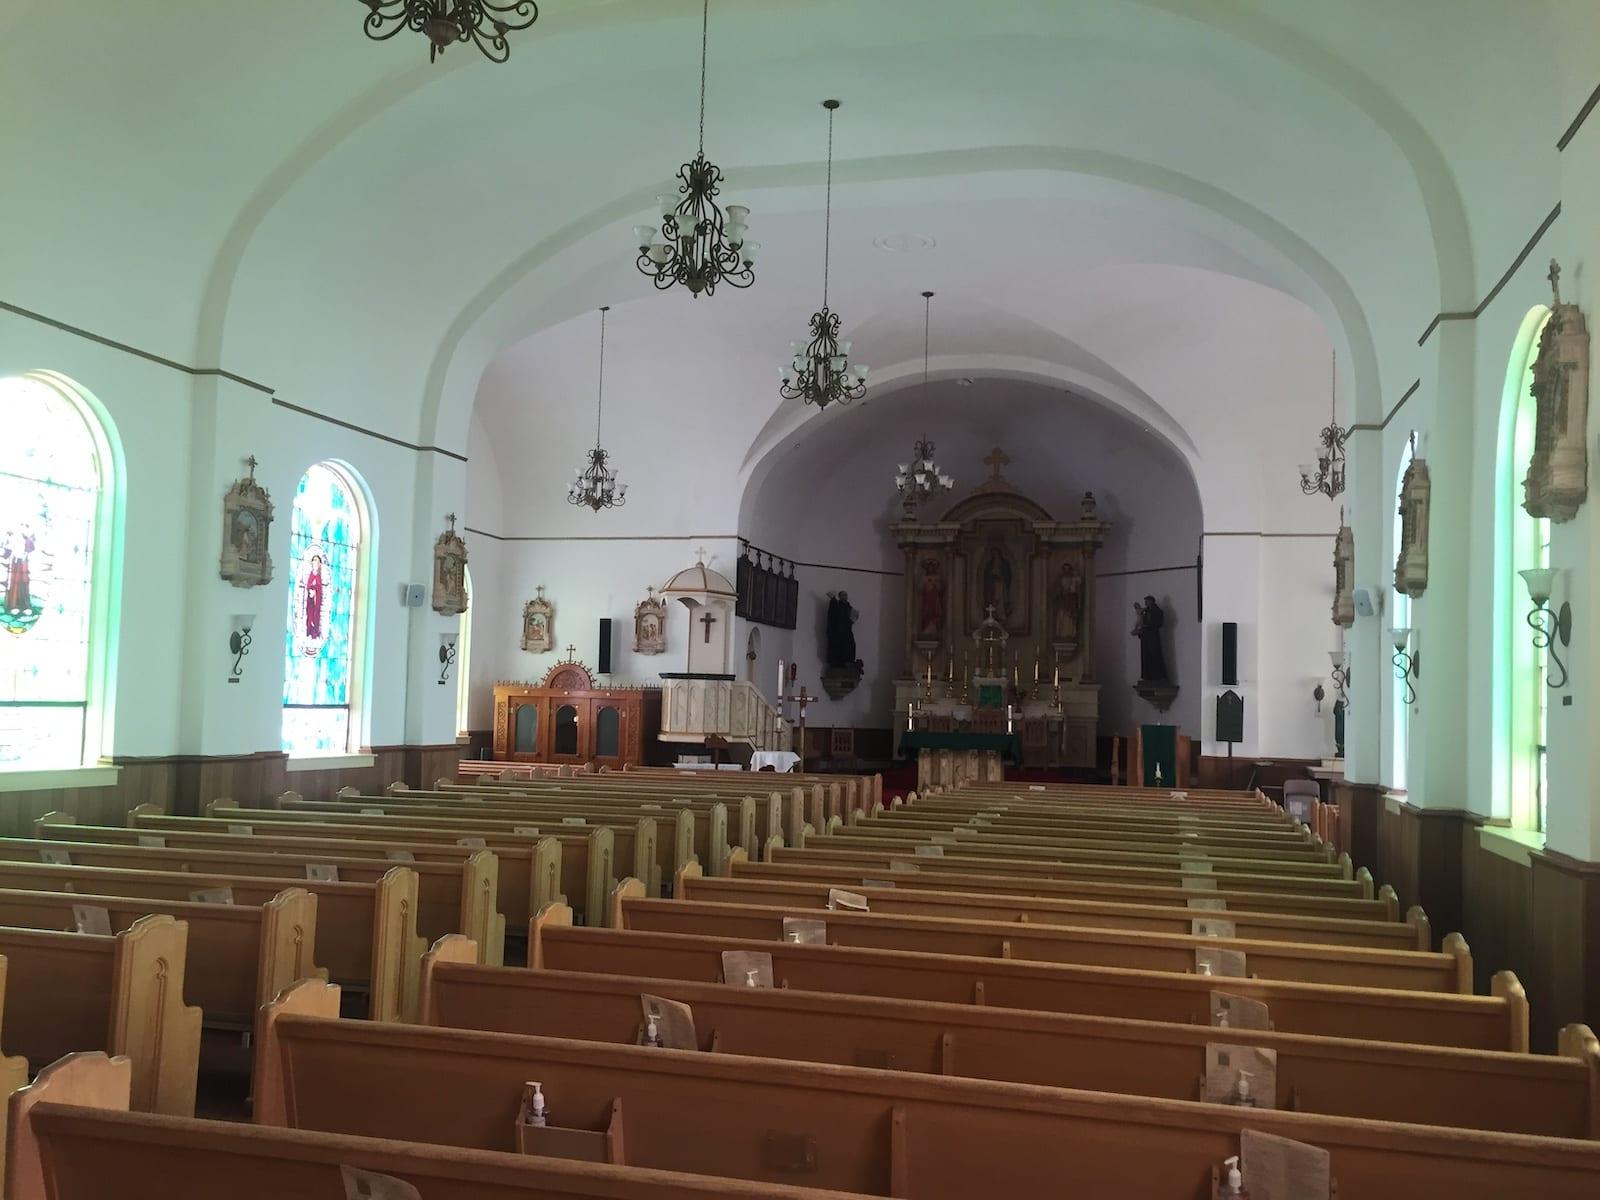 Conejos Colorado Our Lady of Guadalupe Parish Interior